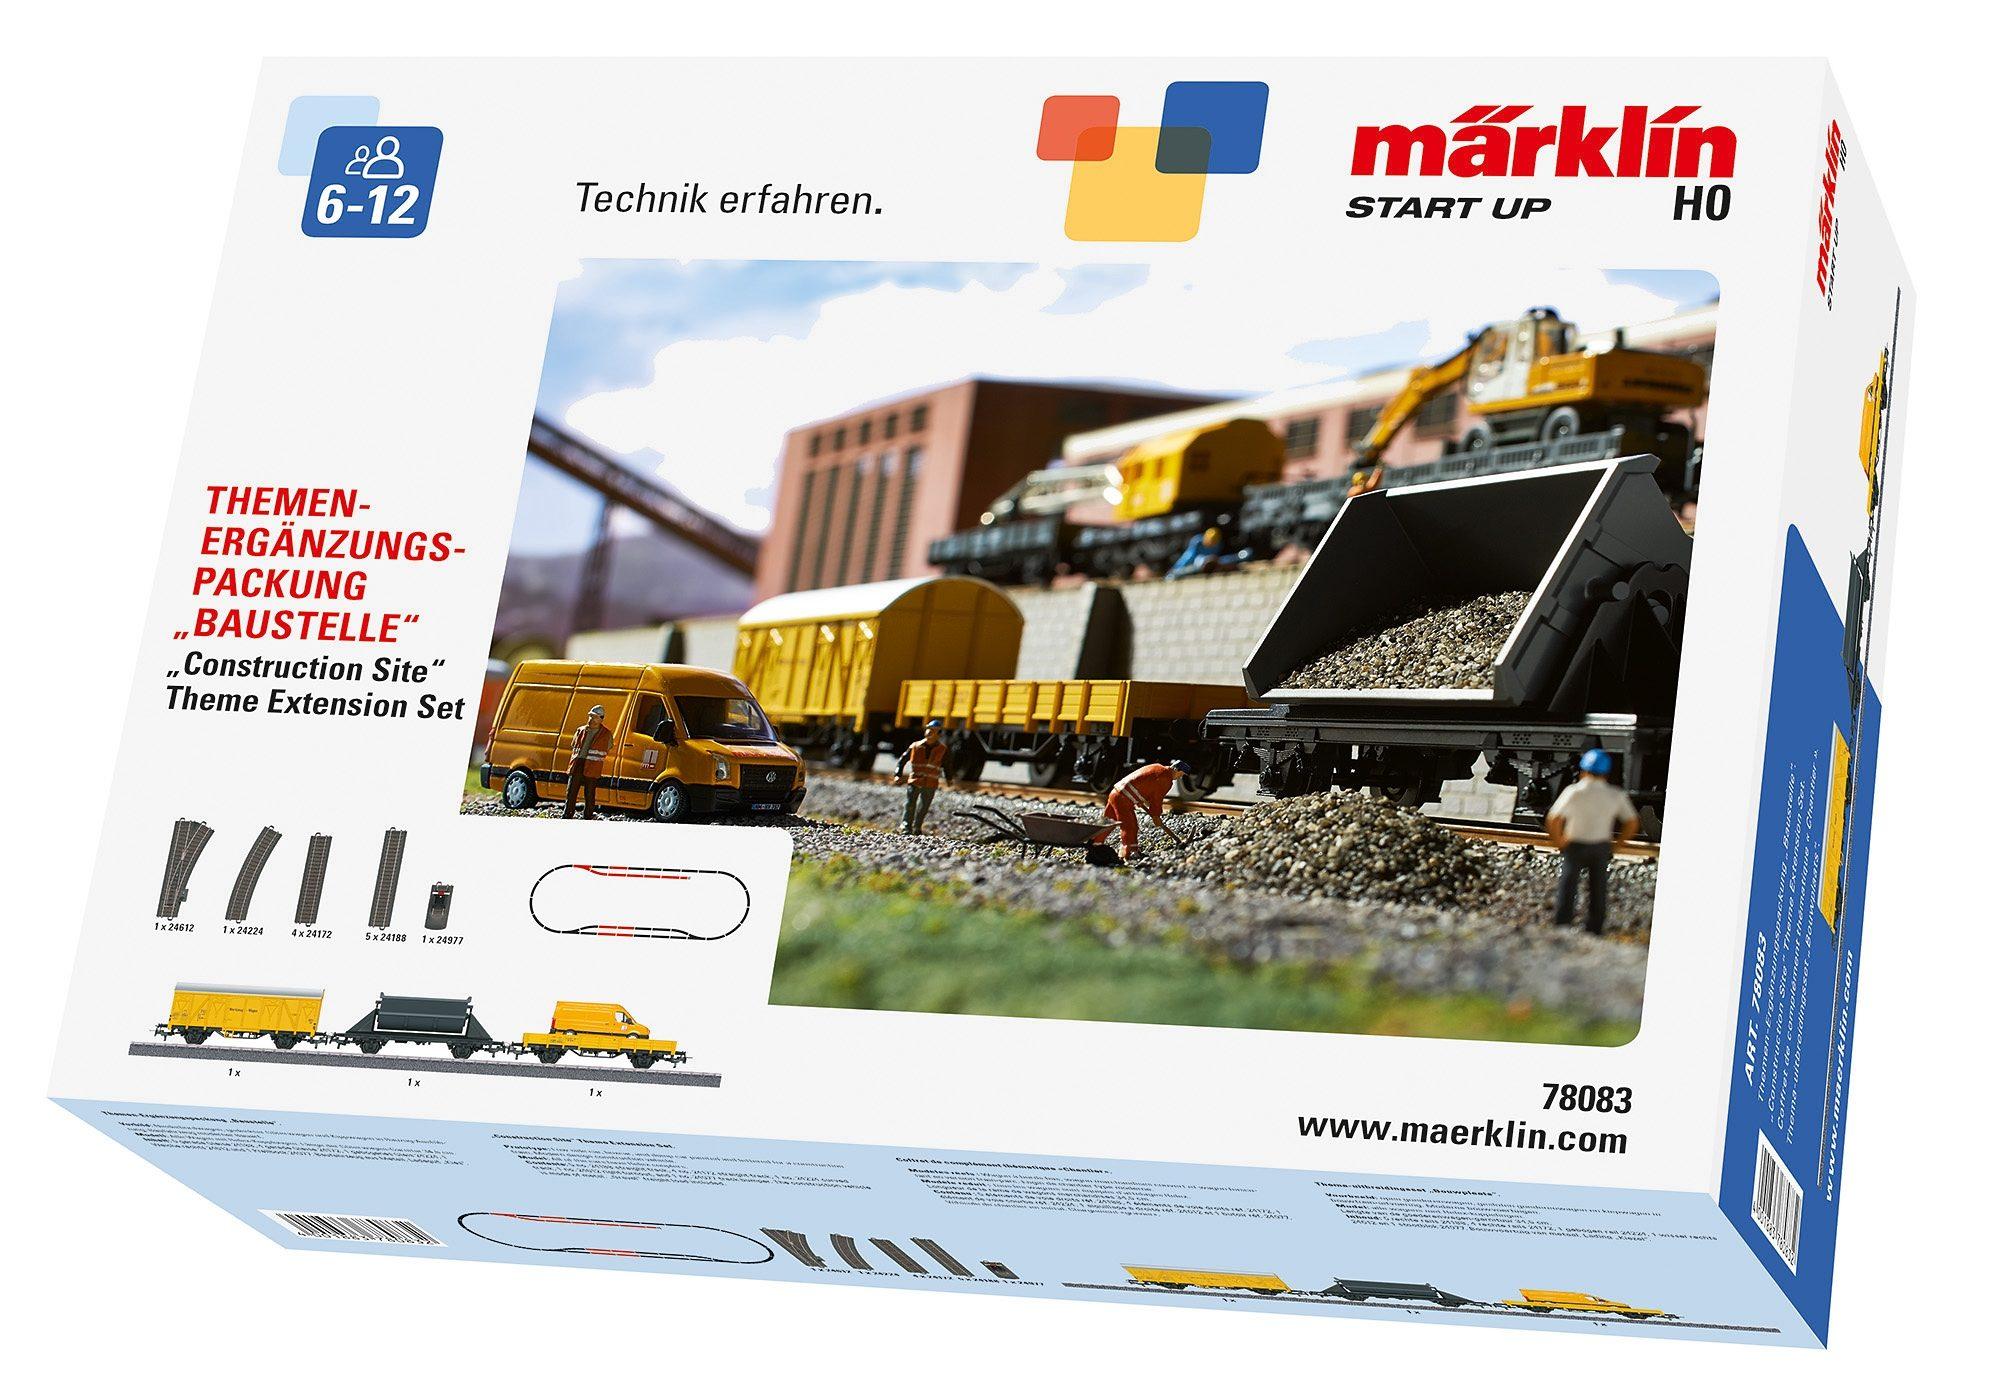 Märklin Erweiterungs-Set, »Märklin Start up - Themen-Ergänzungspaket Baustelle - 78083«.